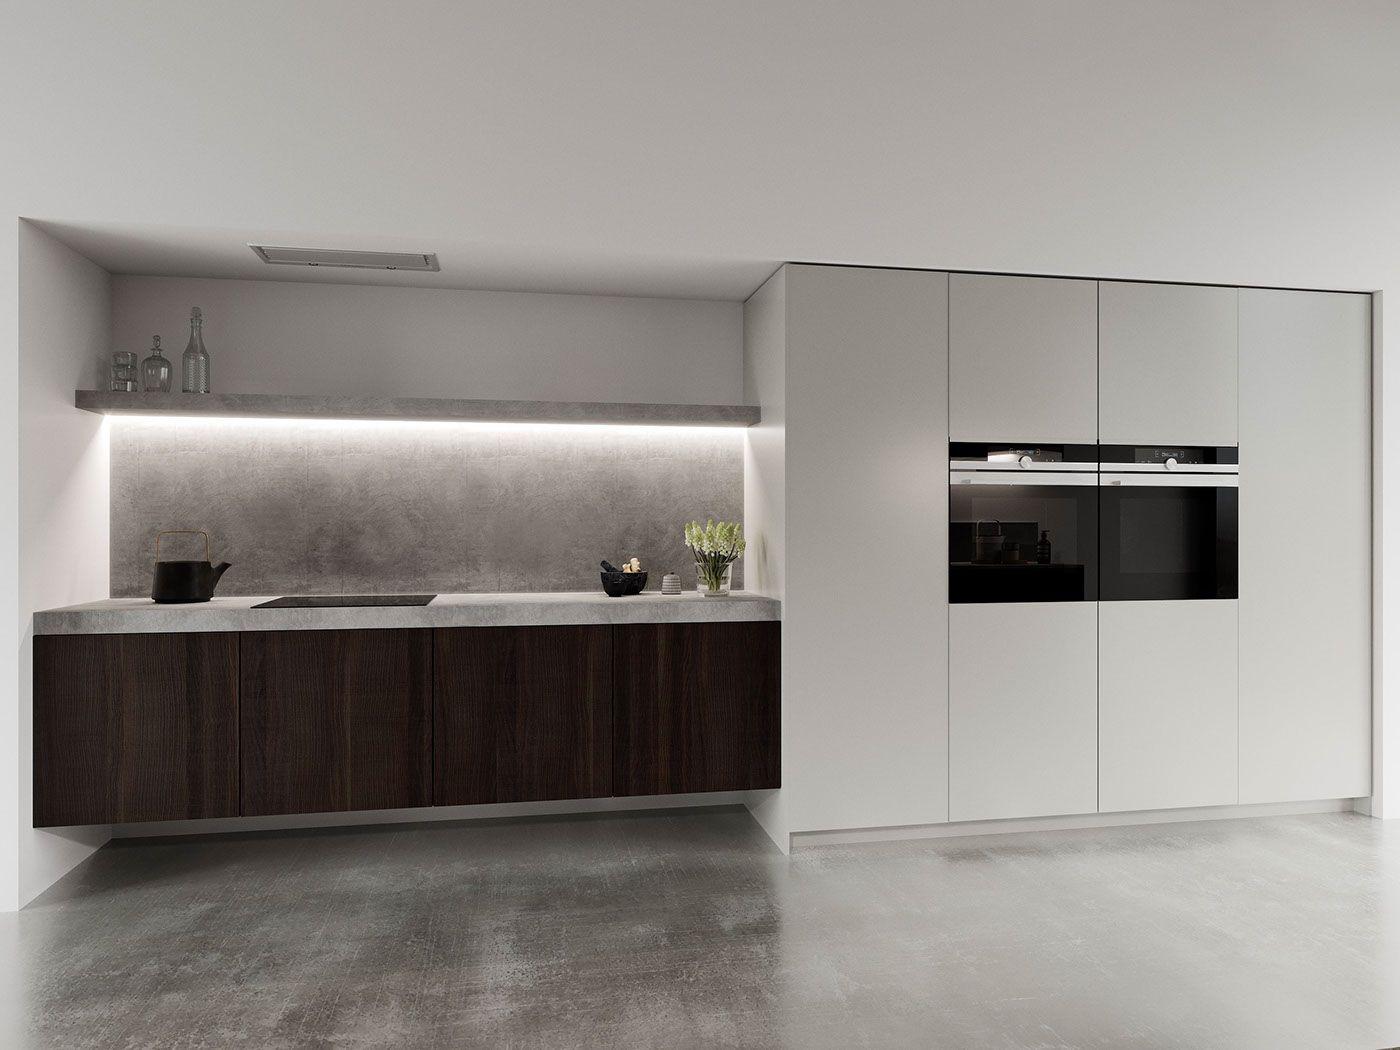 Modern kitchen catalouge i on behance h o m e kitchen u dining